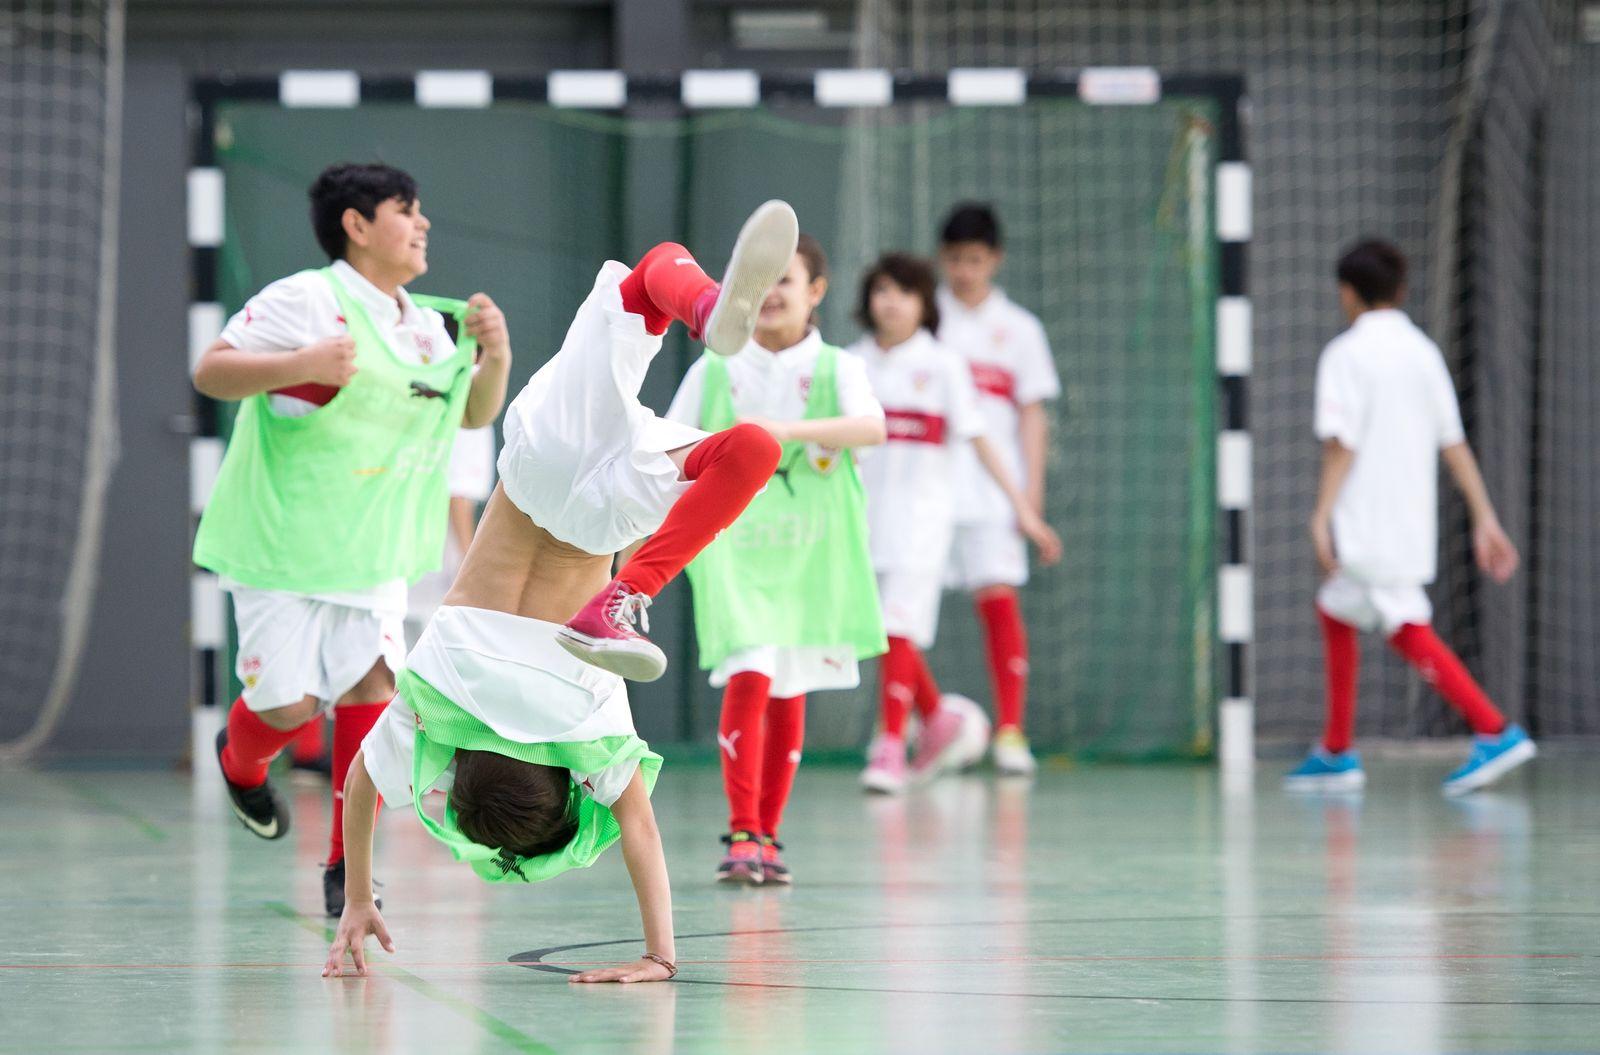 Kinder- und Jugendsport